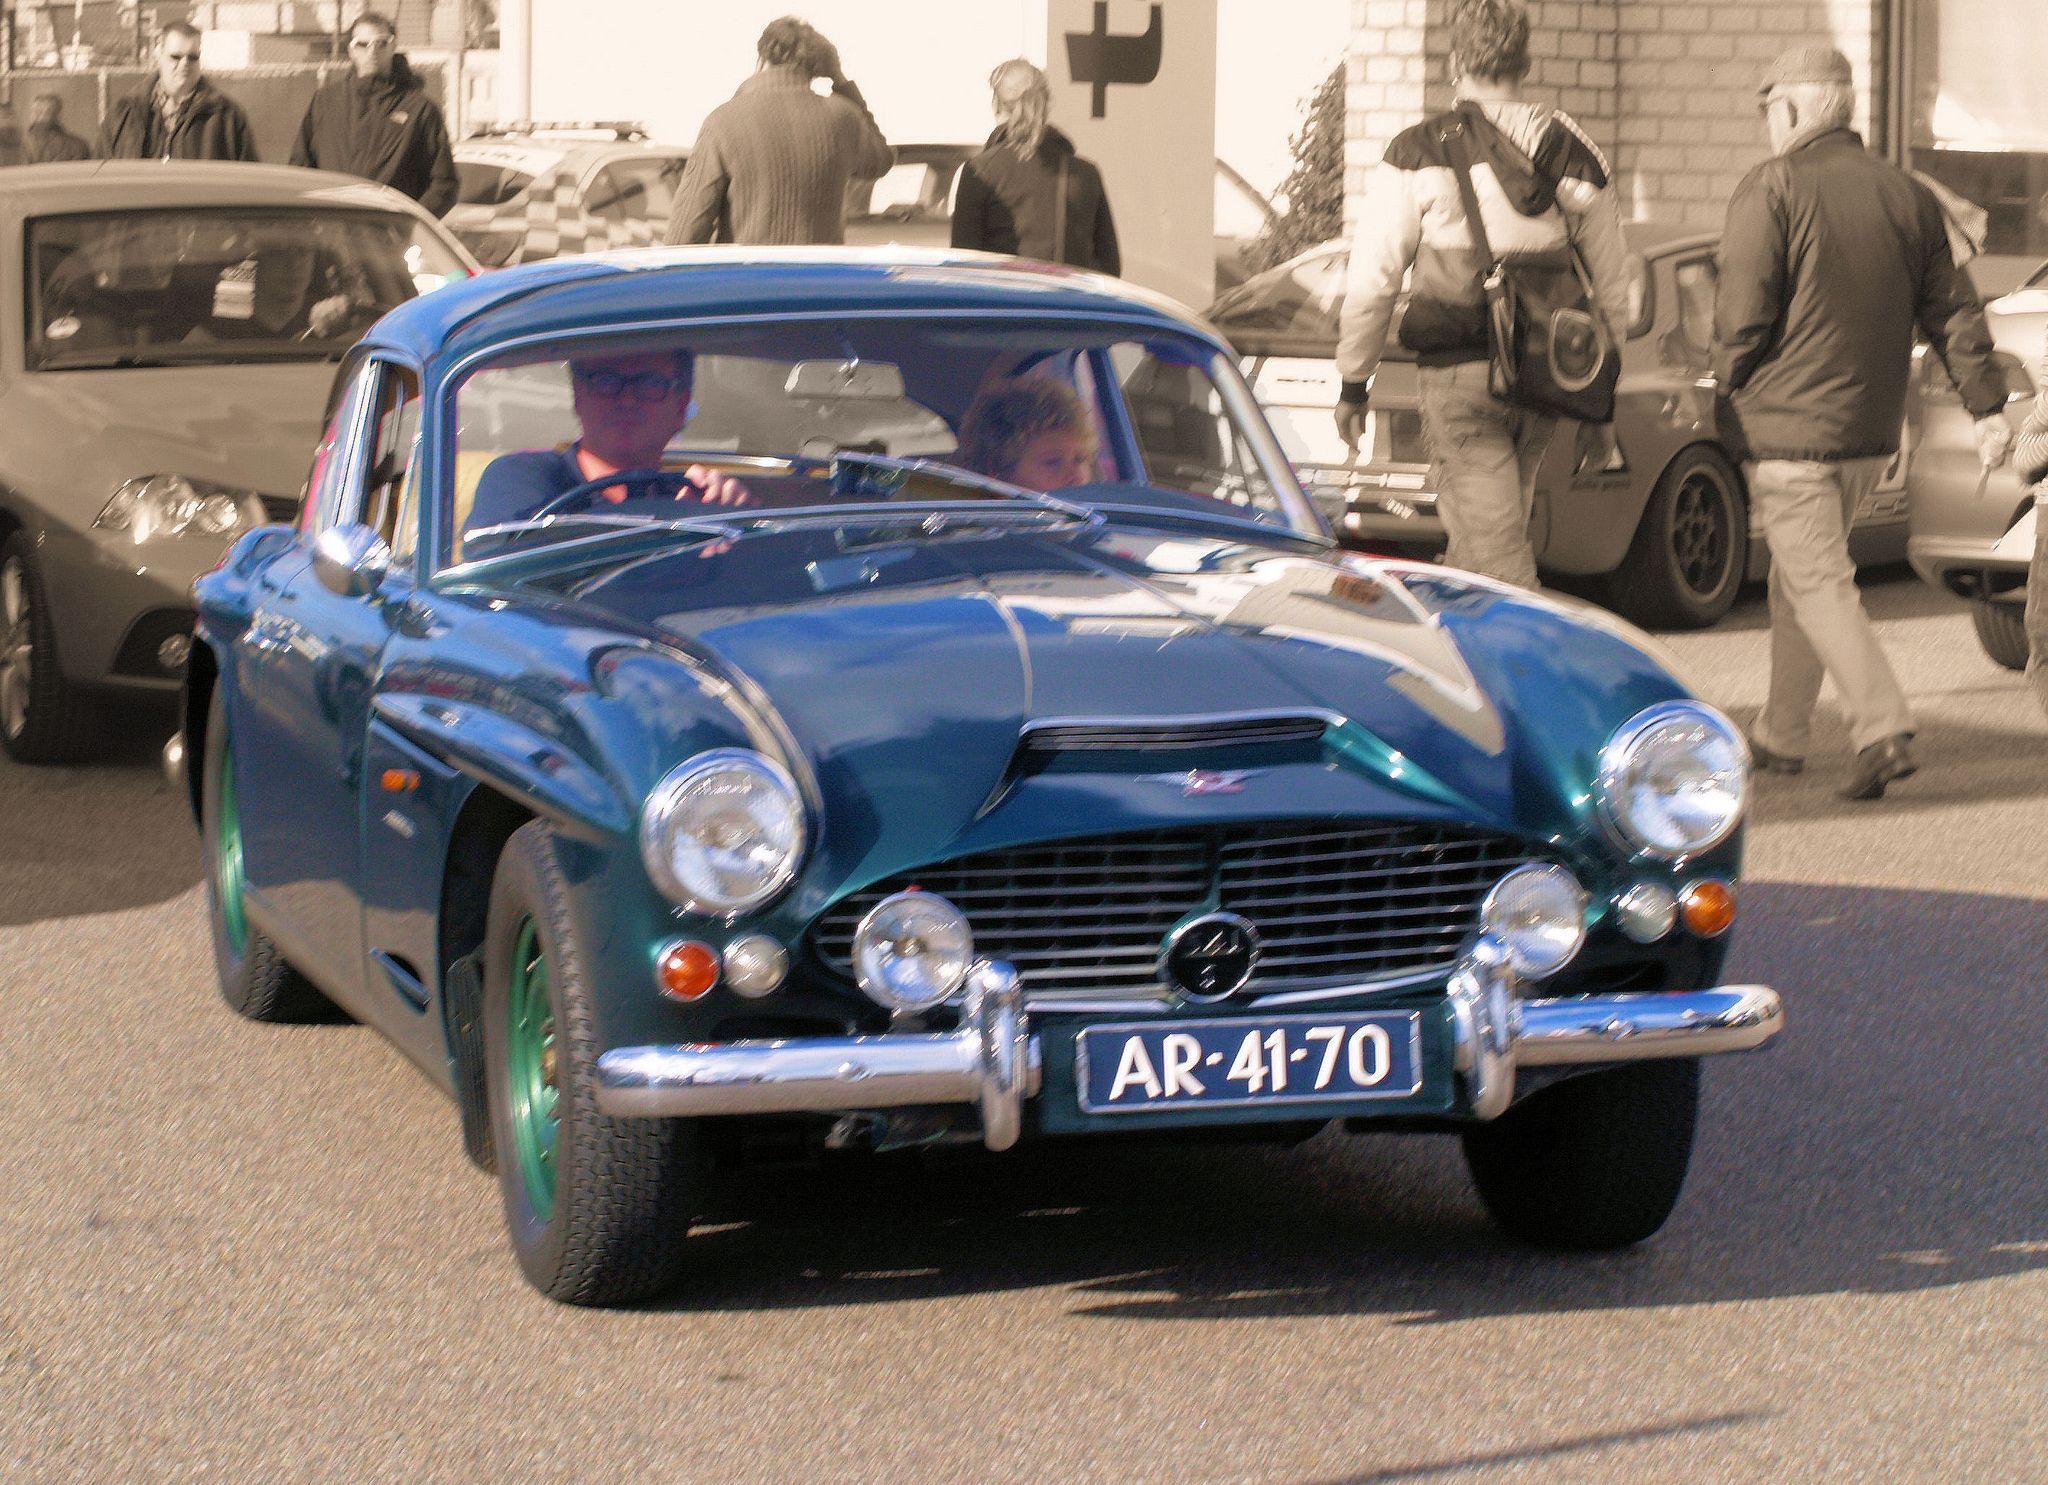 Jensen S Jensen Motors Ltd Jensen Cars Ltd